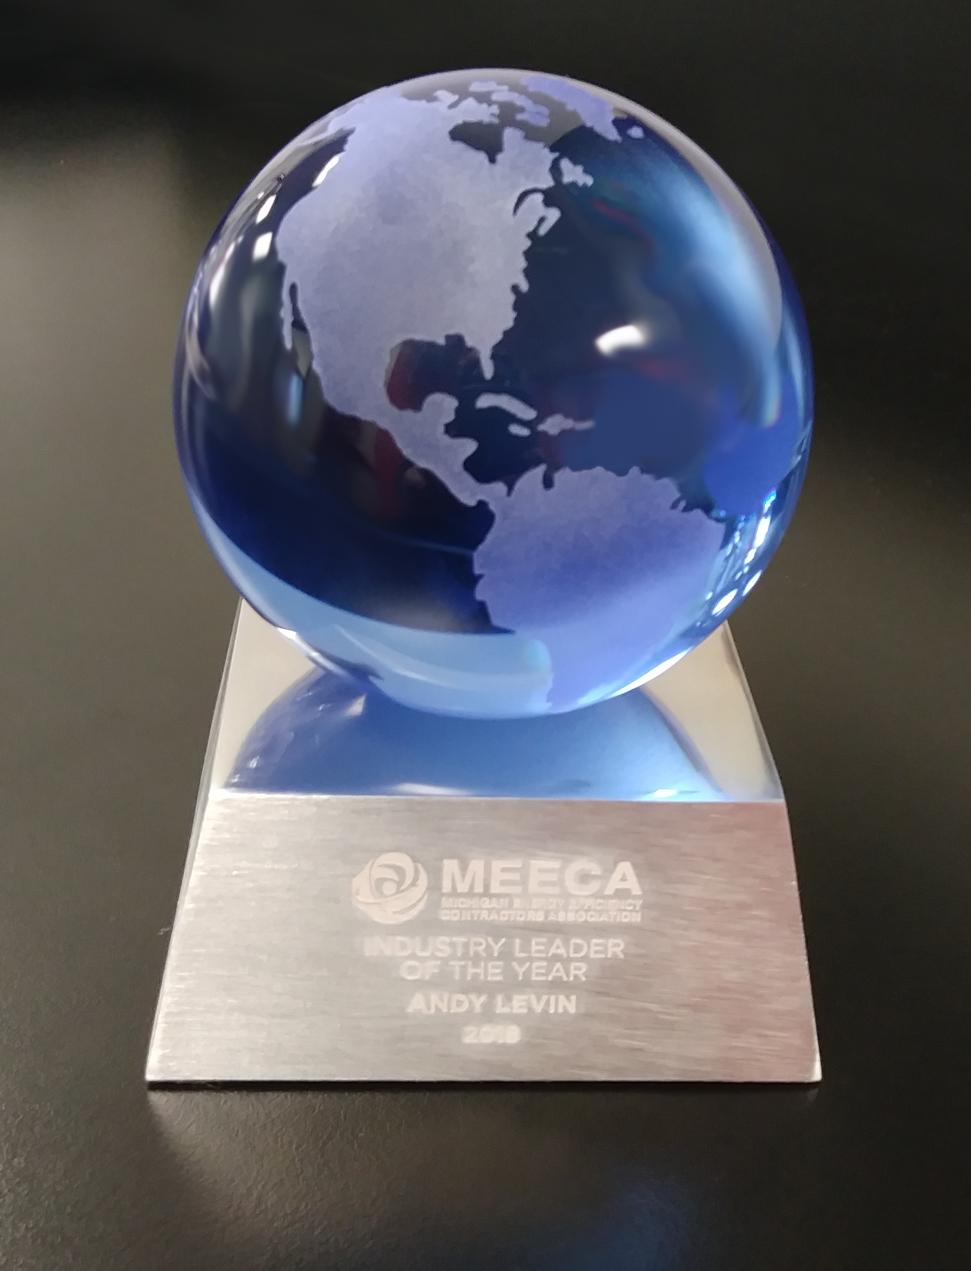 Meeca Award